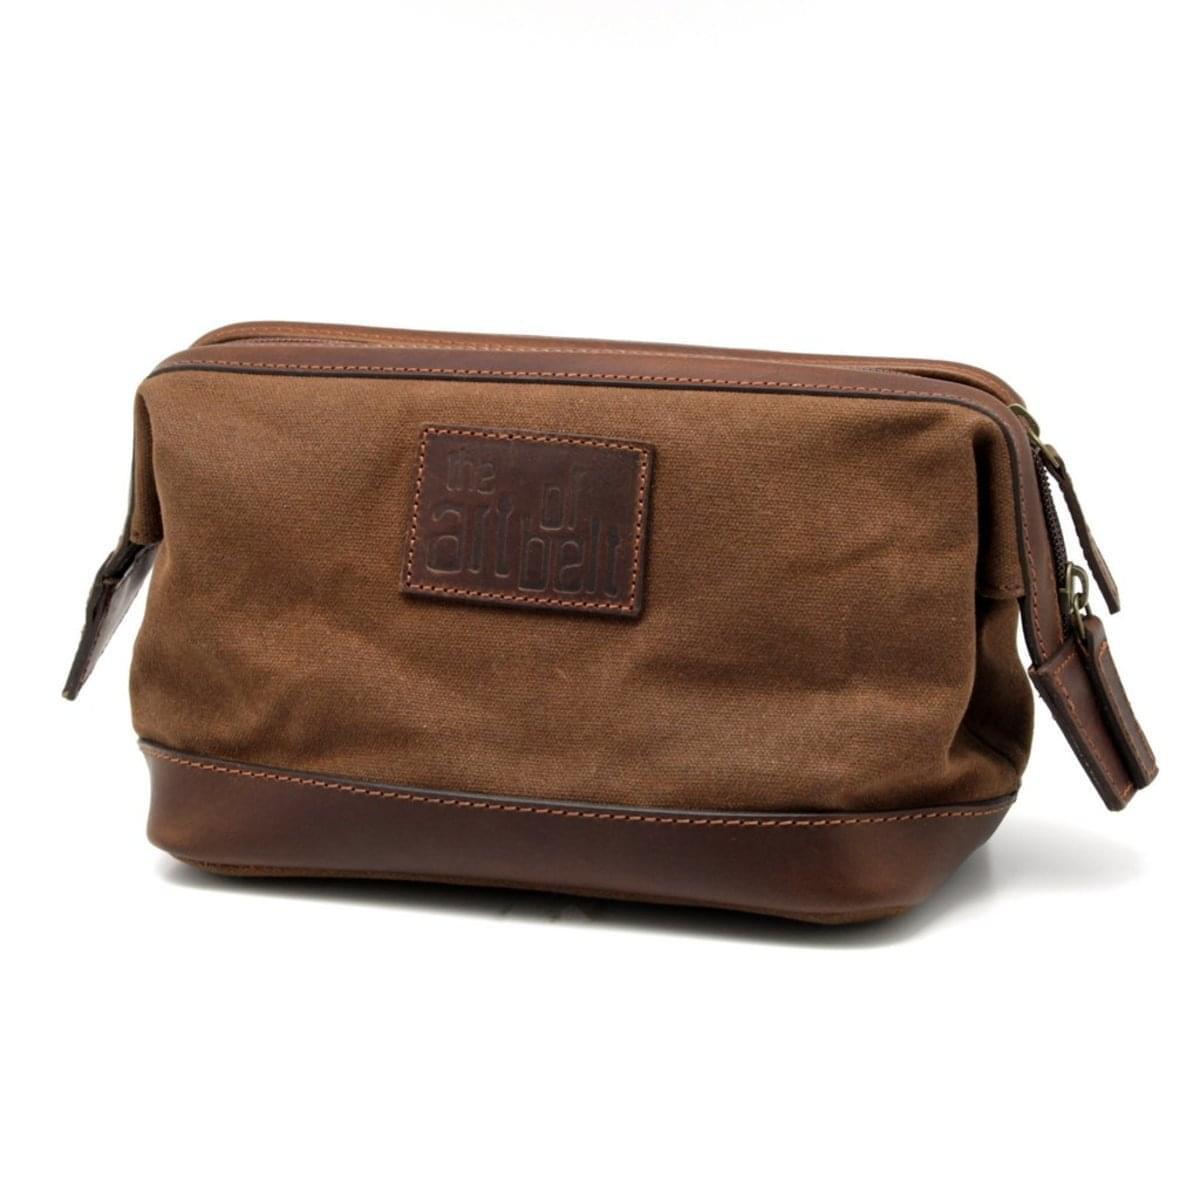 Panská kožená kozmetická taška 8208